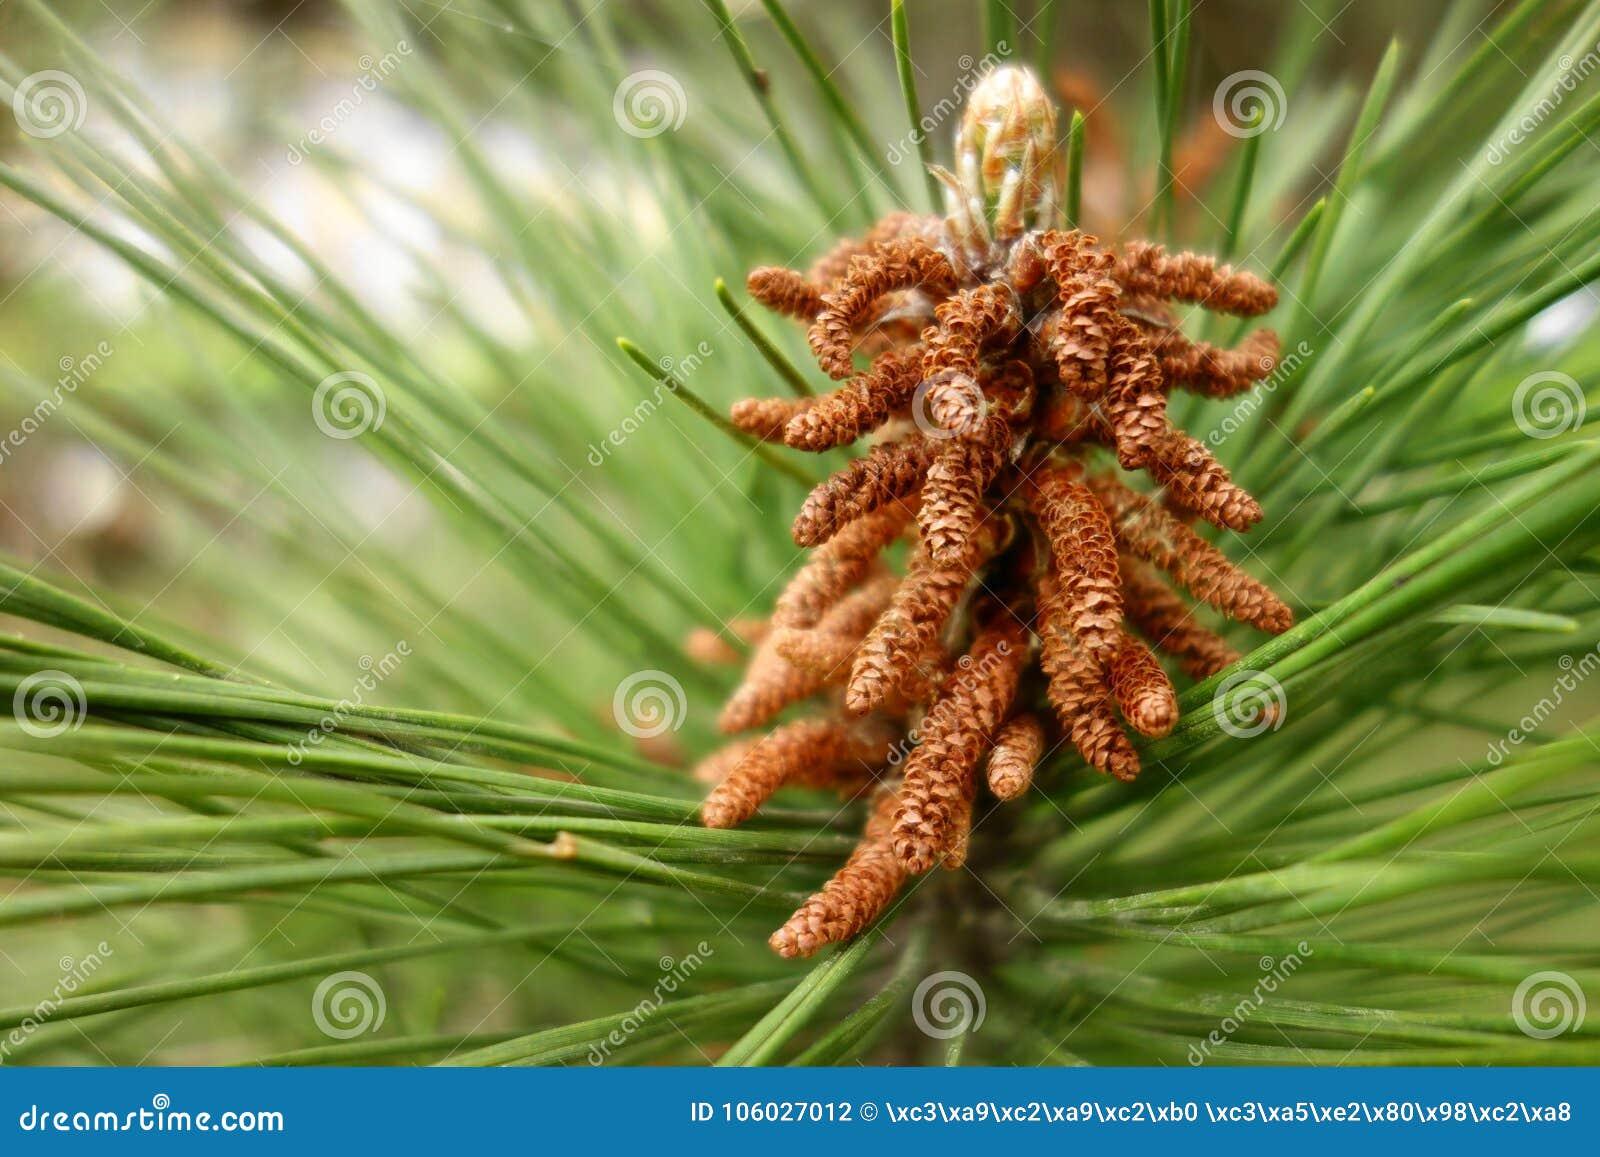 A pine tree flower